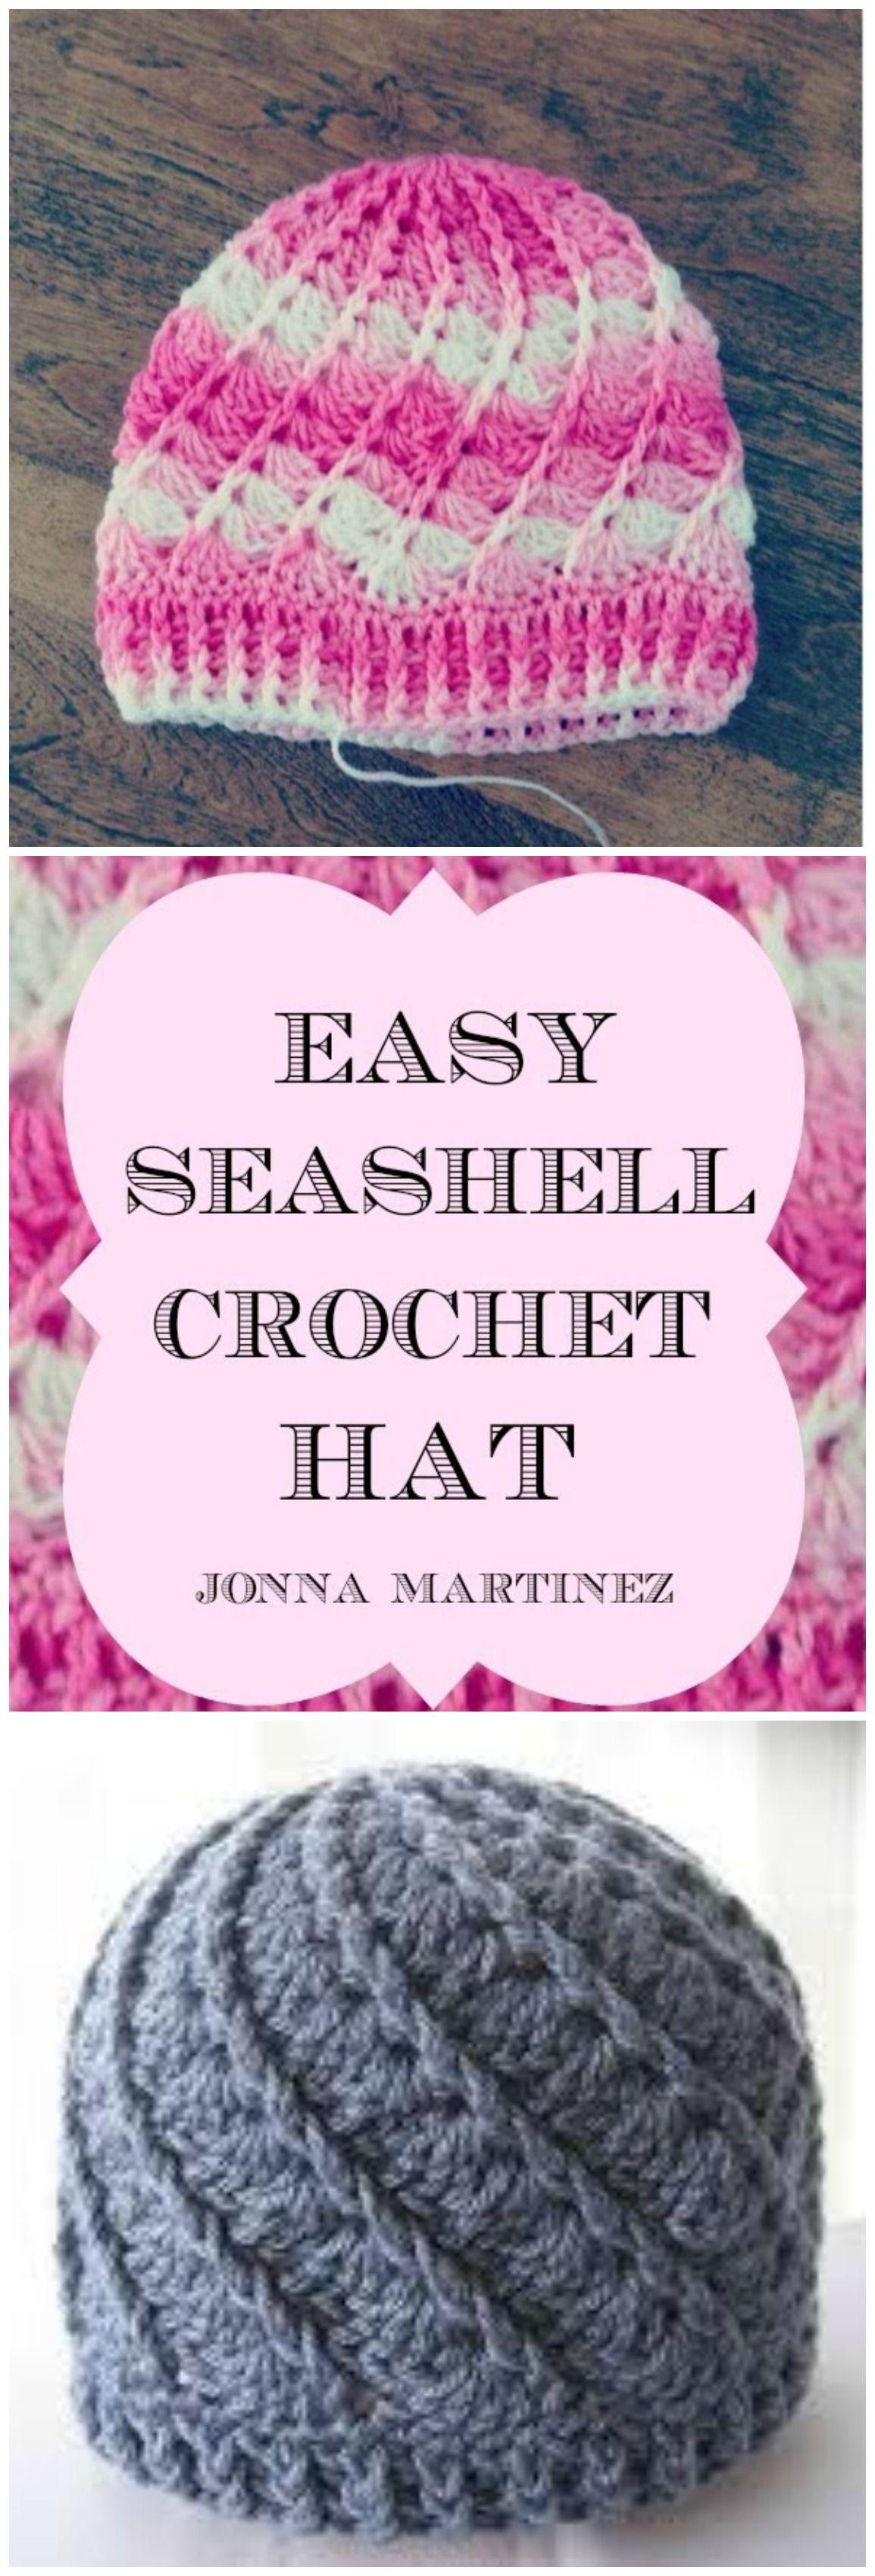 How to Crochet Sea Shell Hat | Mütze, Häkeln und Hauben